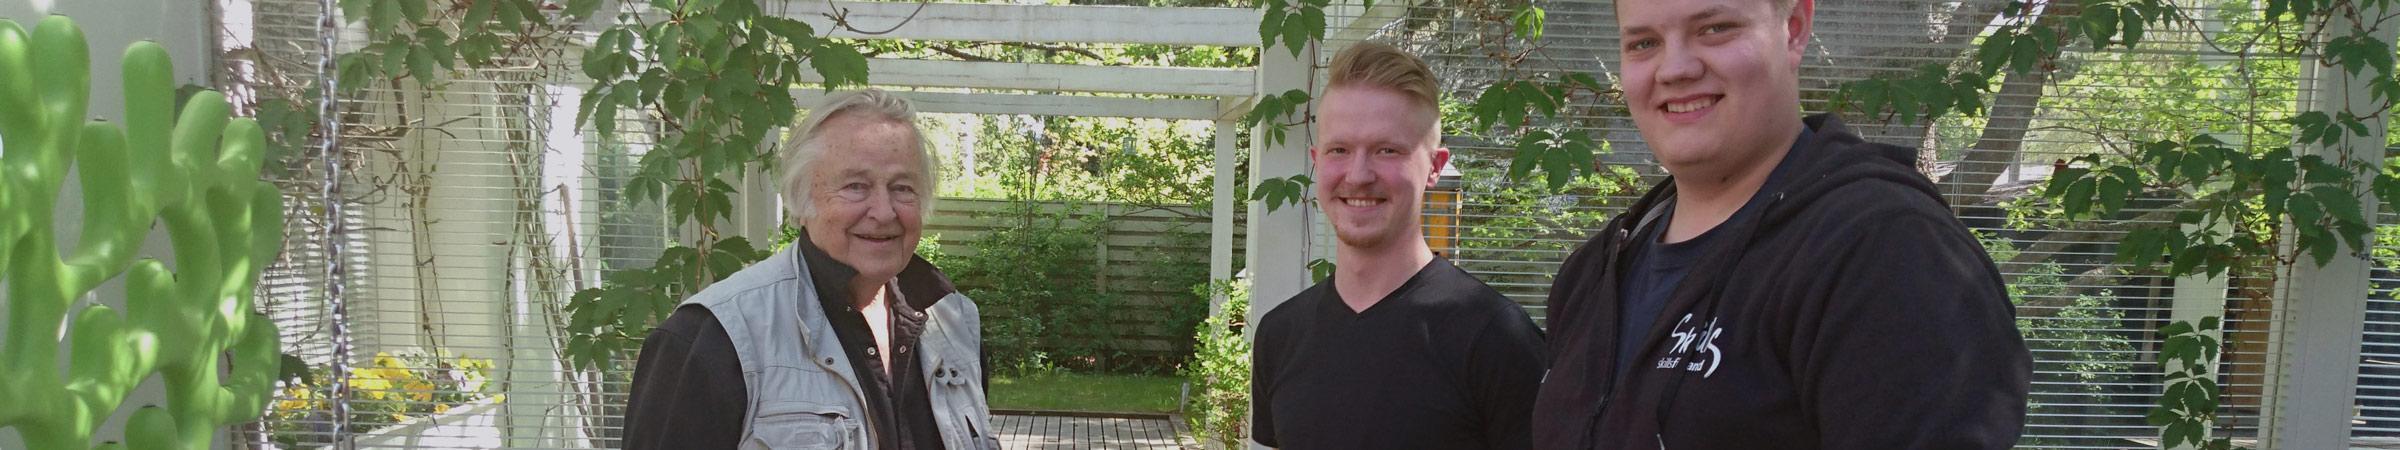 Eero Aarnio ja Puulon